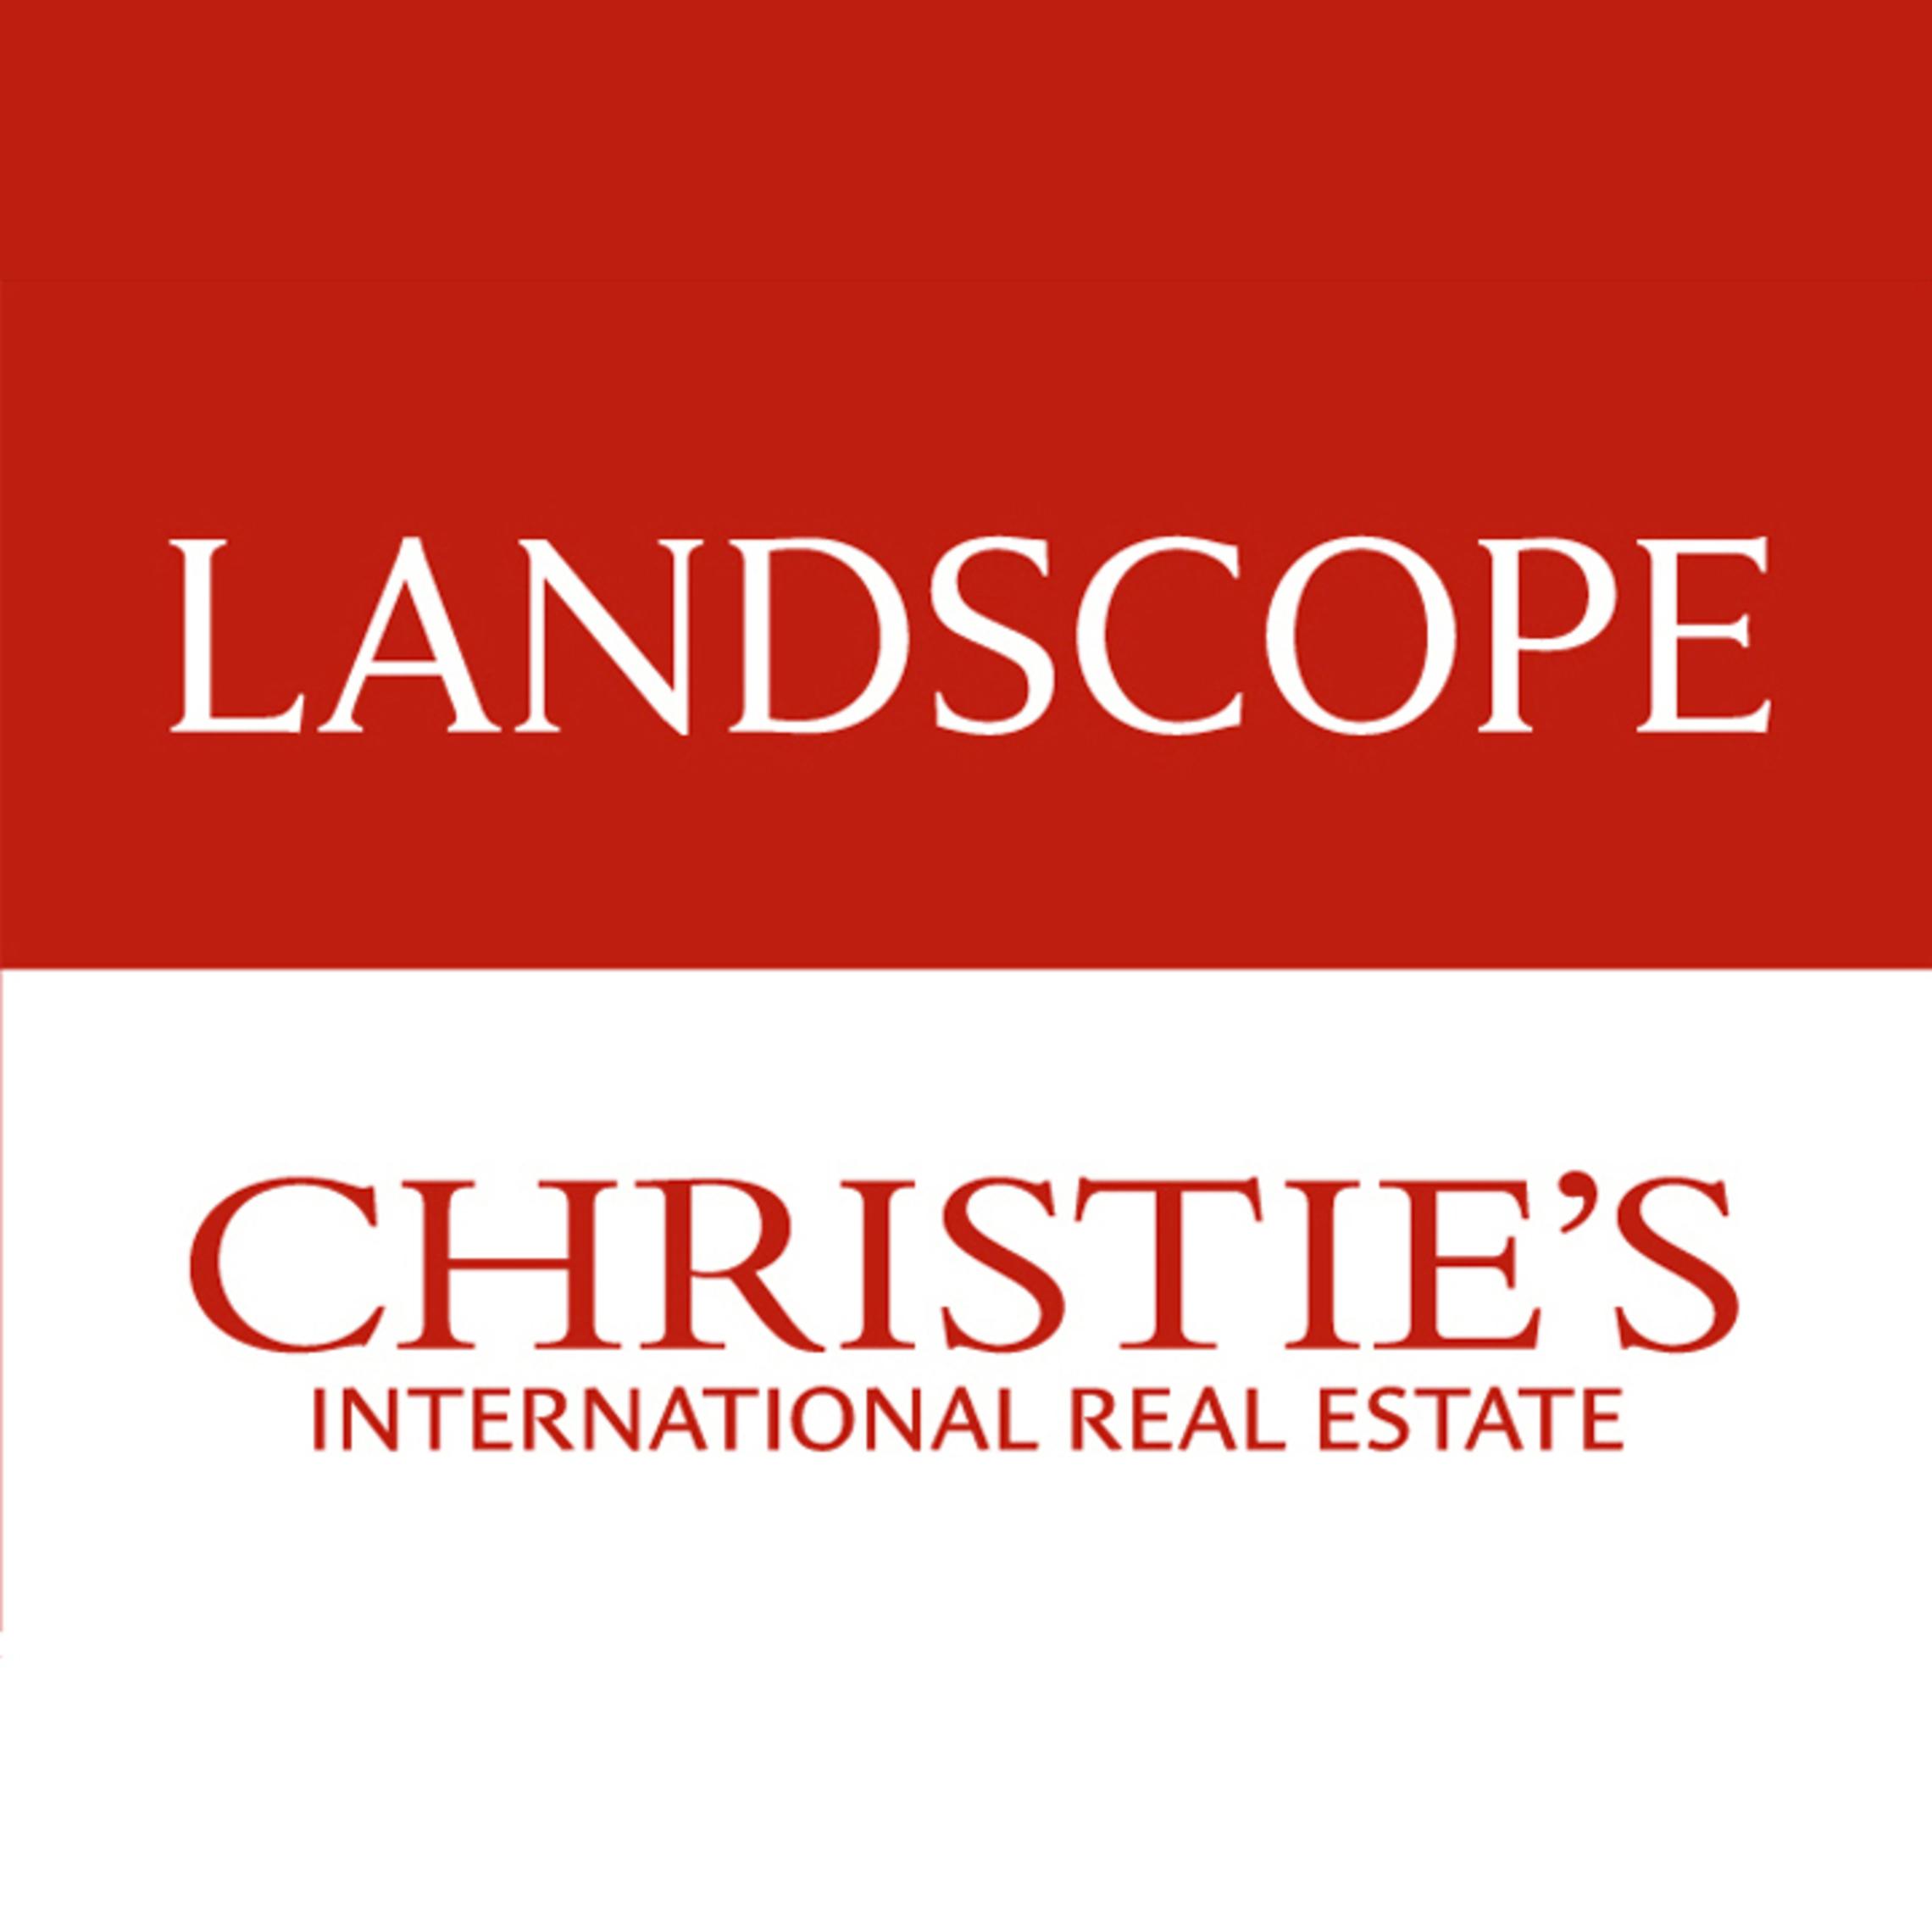 landscope christie s- company logo